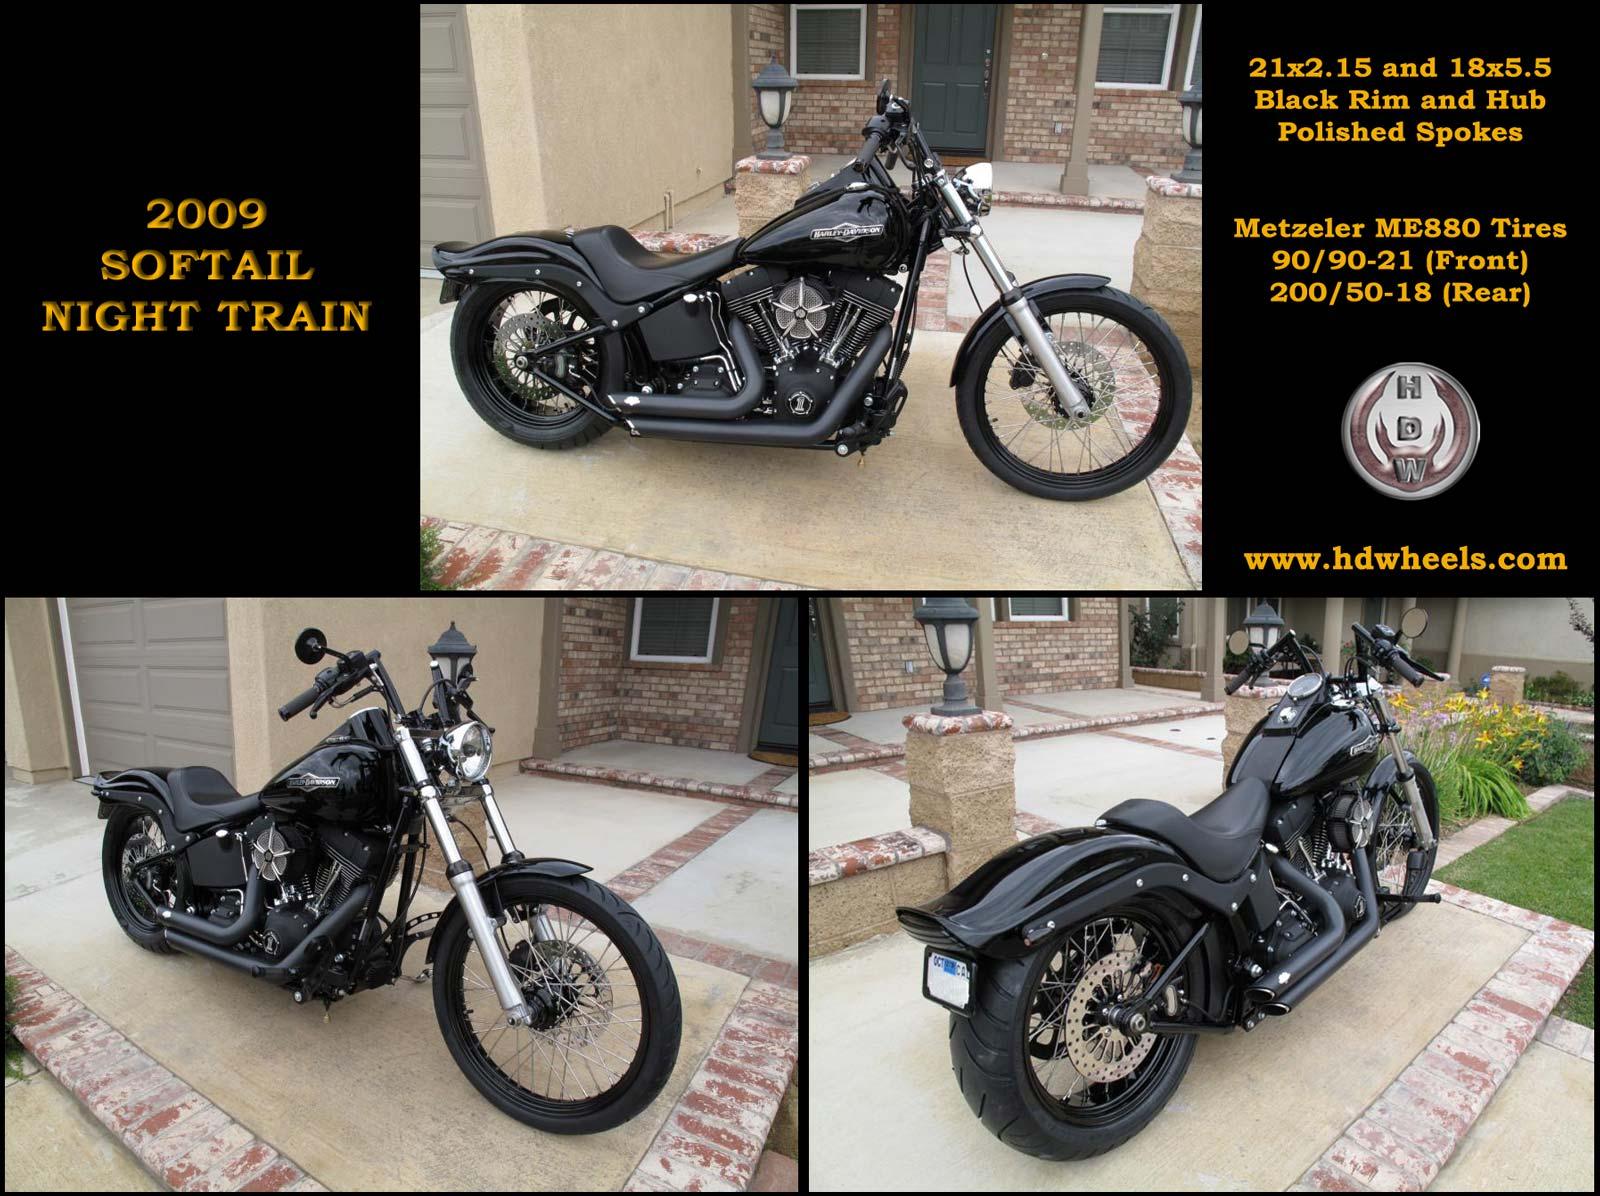 Wiring 2009 Night Train Trusted Diagrams Harley Davidson Diagram Bike1 Rh Hdwheels Com Rear Fender Kit Chrome Grips For